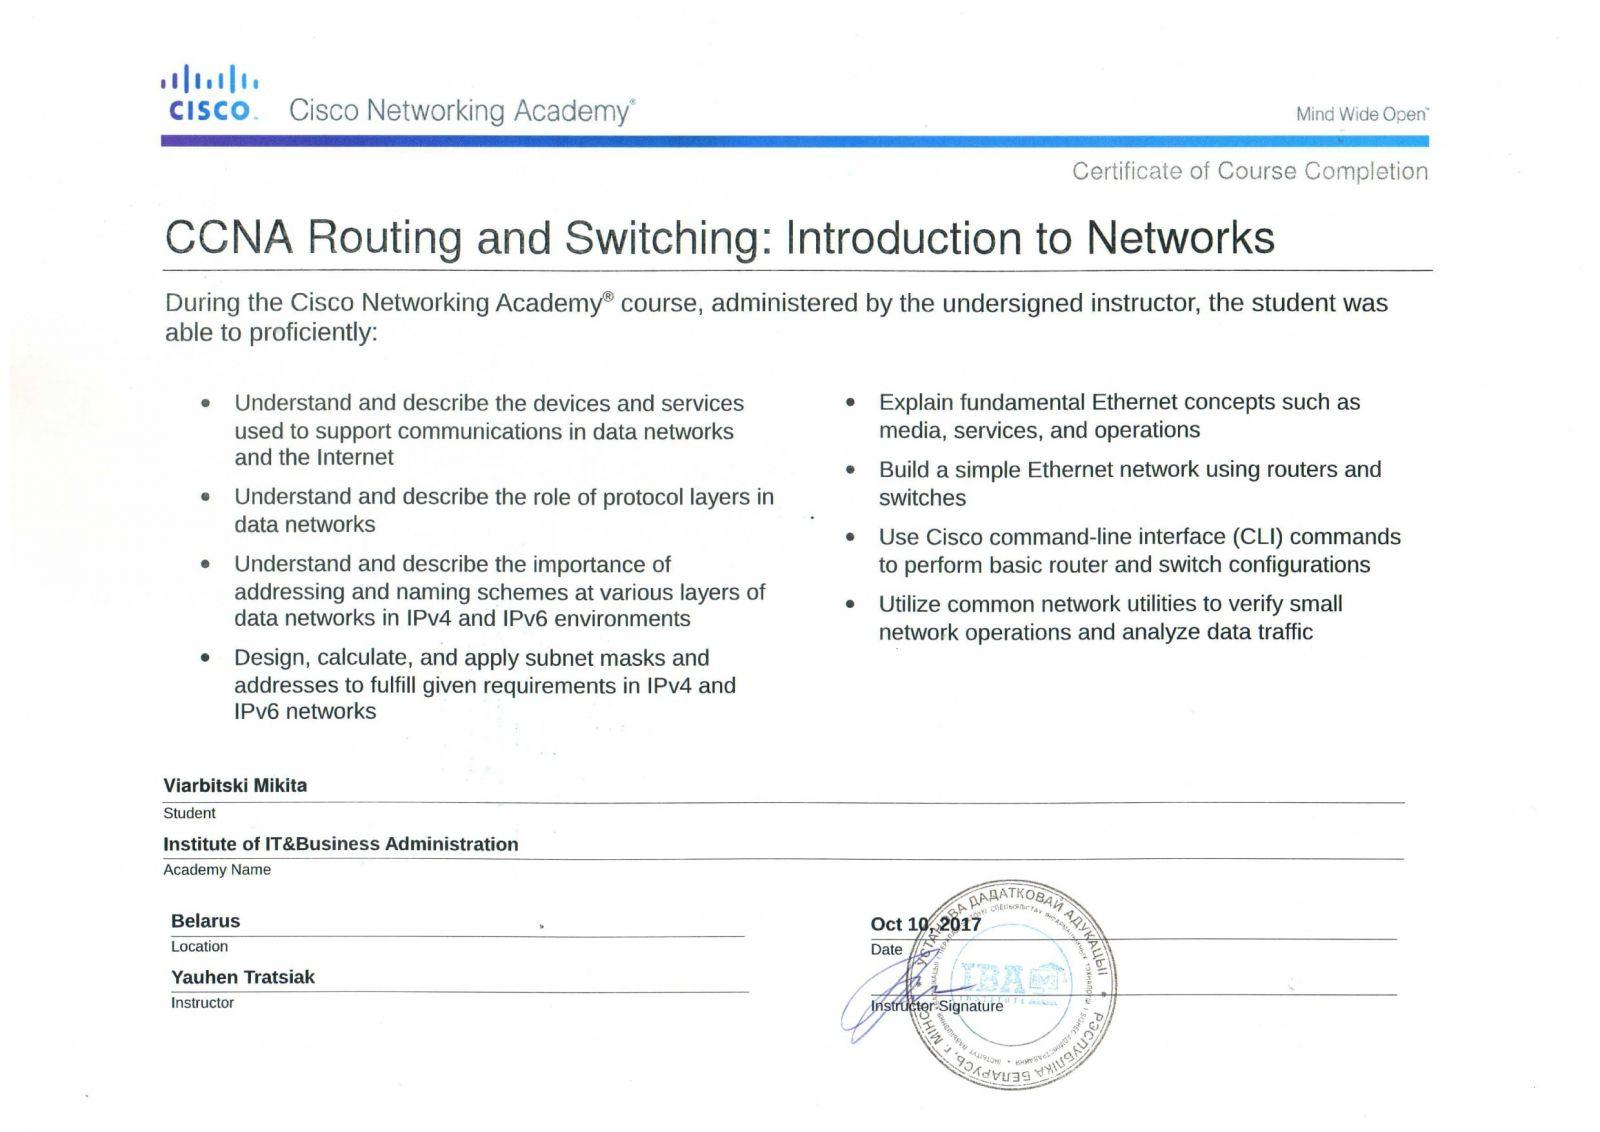 Сертификаты квалификации Cisco 3